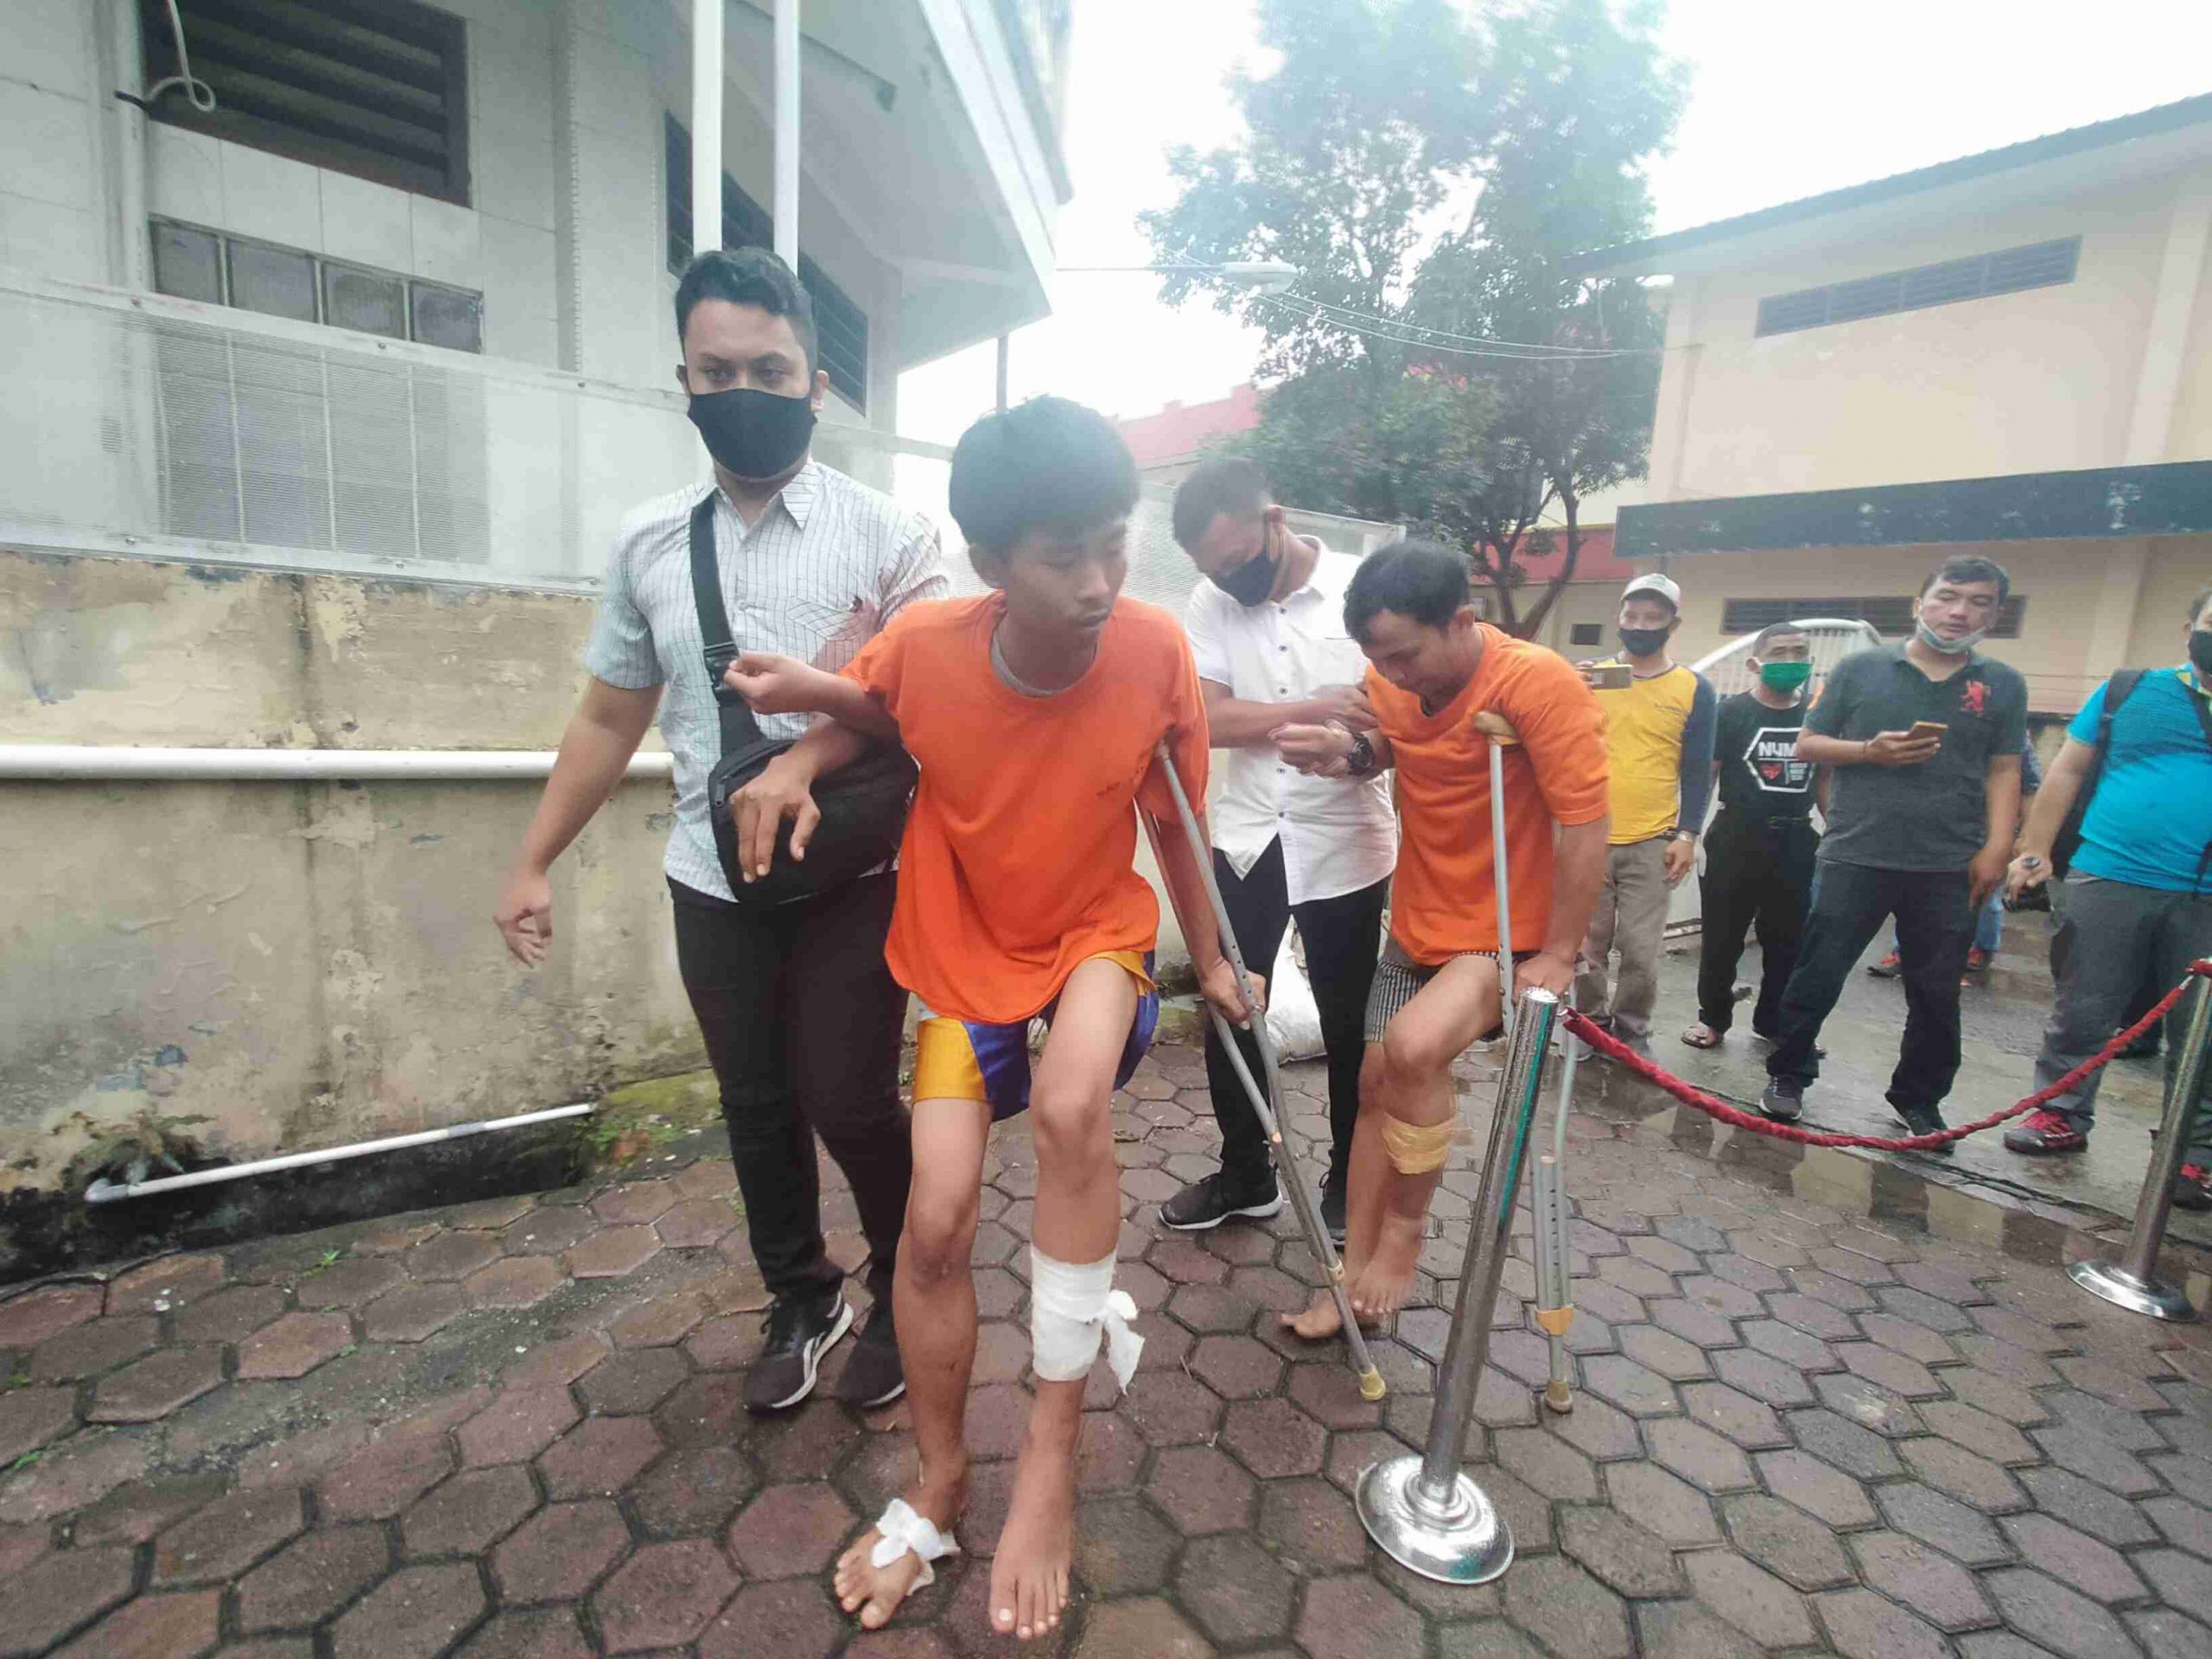 Polrestabes Medan Ringkus 4 Kawanan Jambret, Otak Pelaku Napi Asimilasi Tewas Ditembak